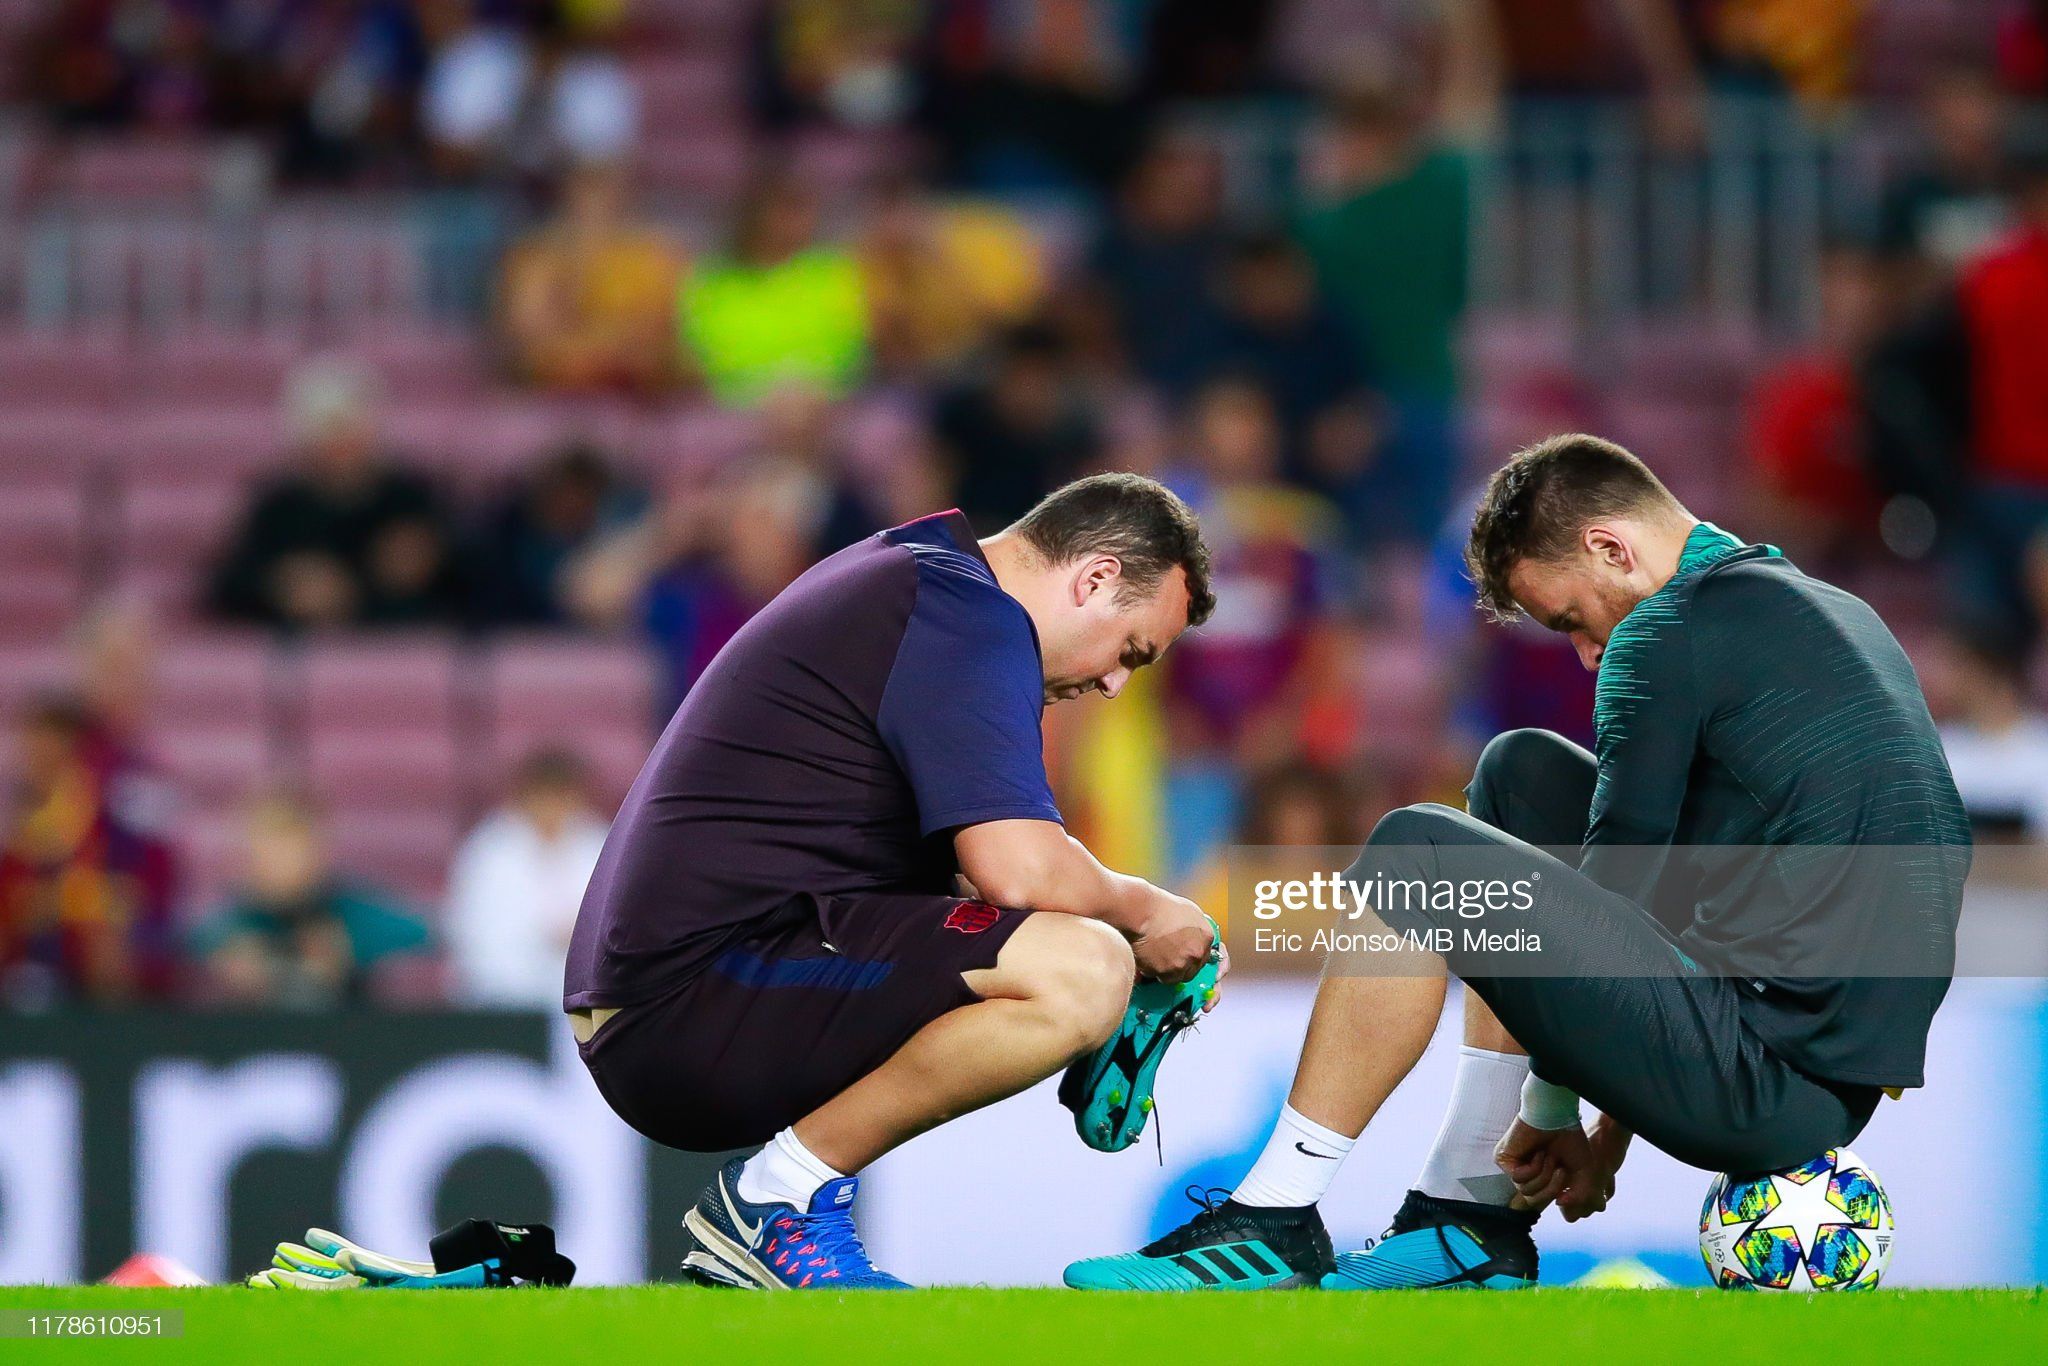 صور مباراة : برشلونة - إنتر 2-1 ( 02-10-2019 )  Neto-of-fc-barcelona-on-the-pitch-during-the-uefa-champions-league-f-picture-id1178610951?s=2048x2048